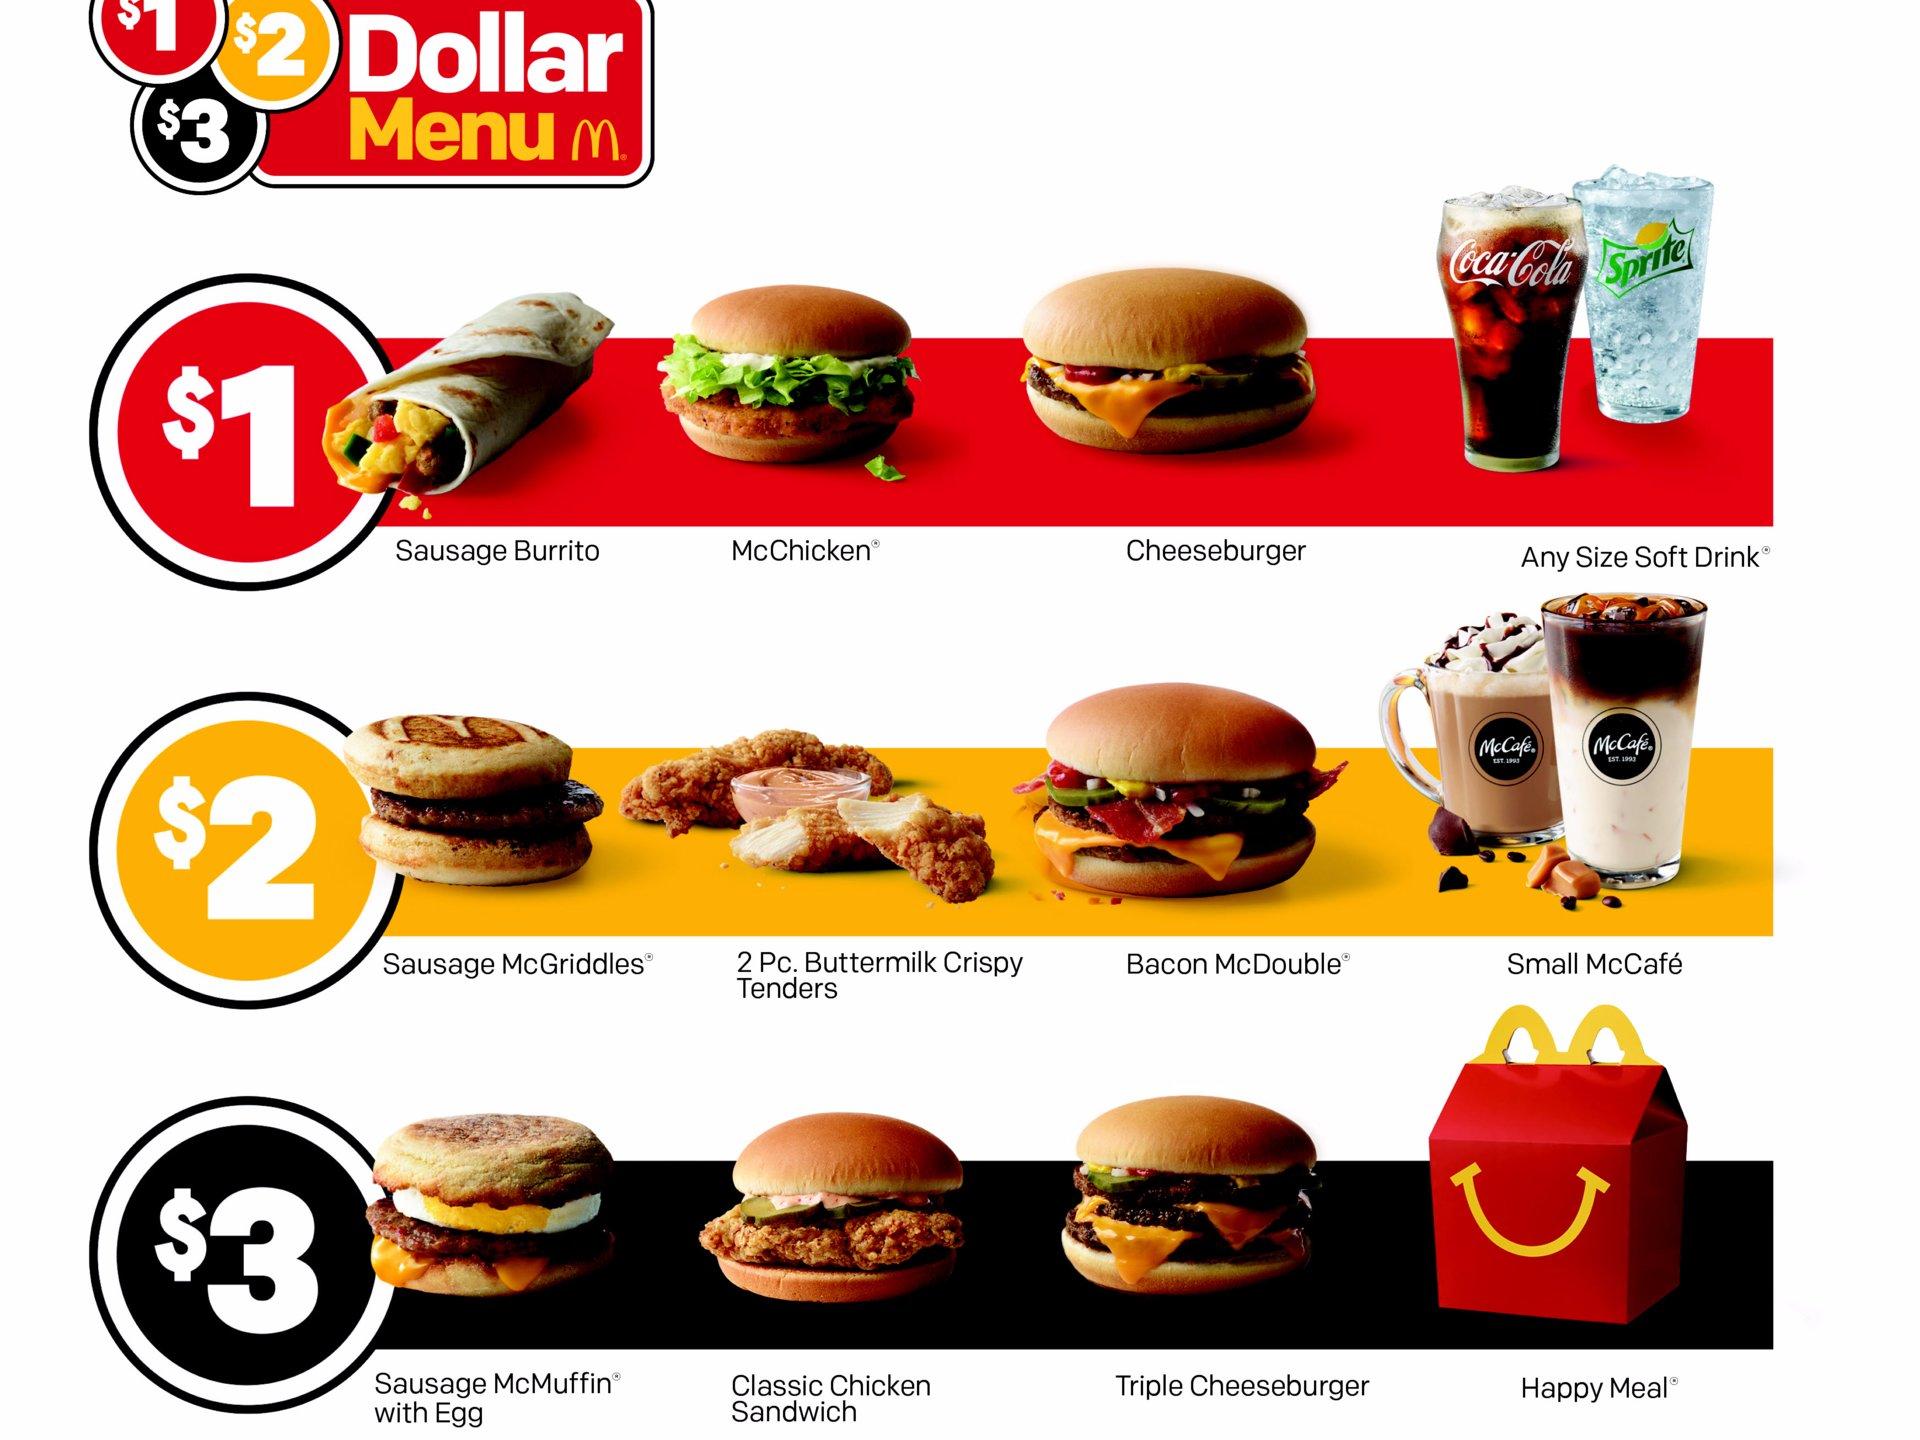 Dollar Menu at McDonald's